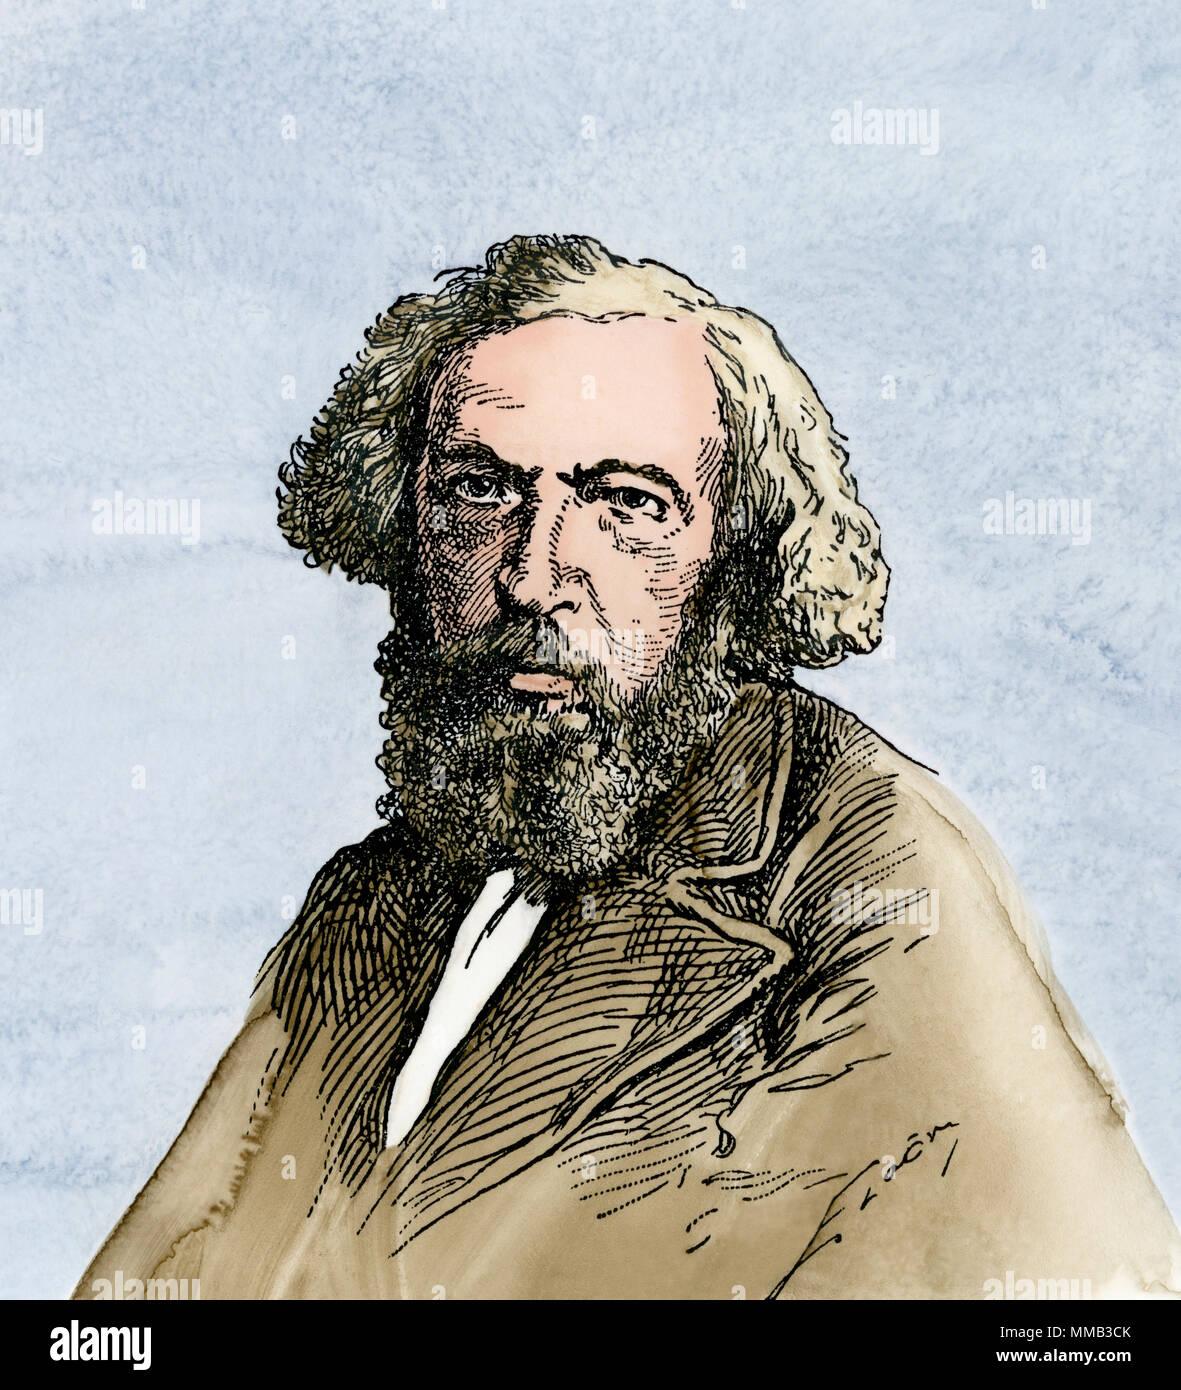 Mendeleev Banque d'image et photos - Alamy